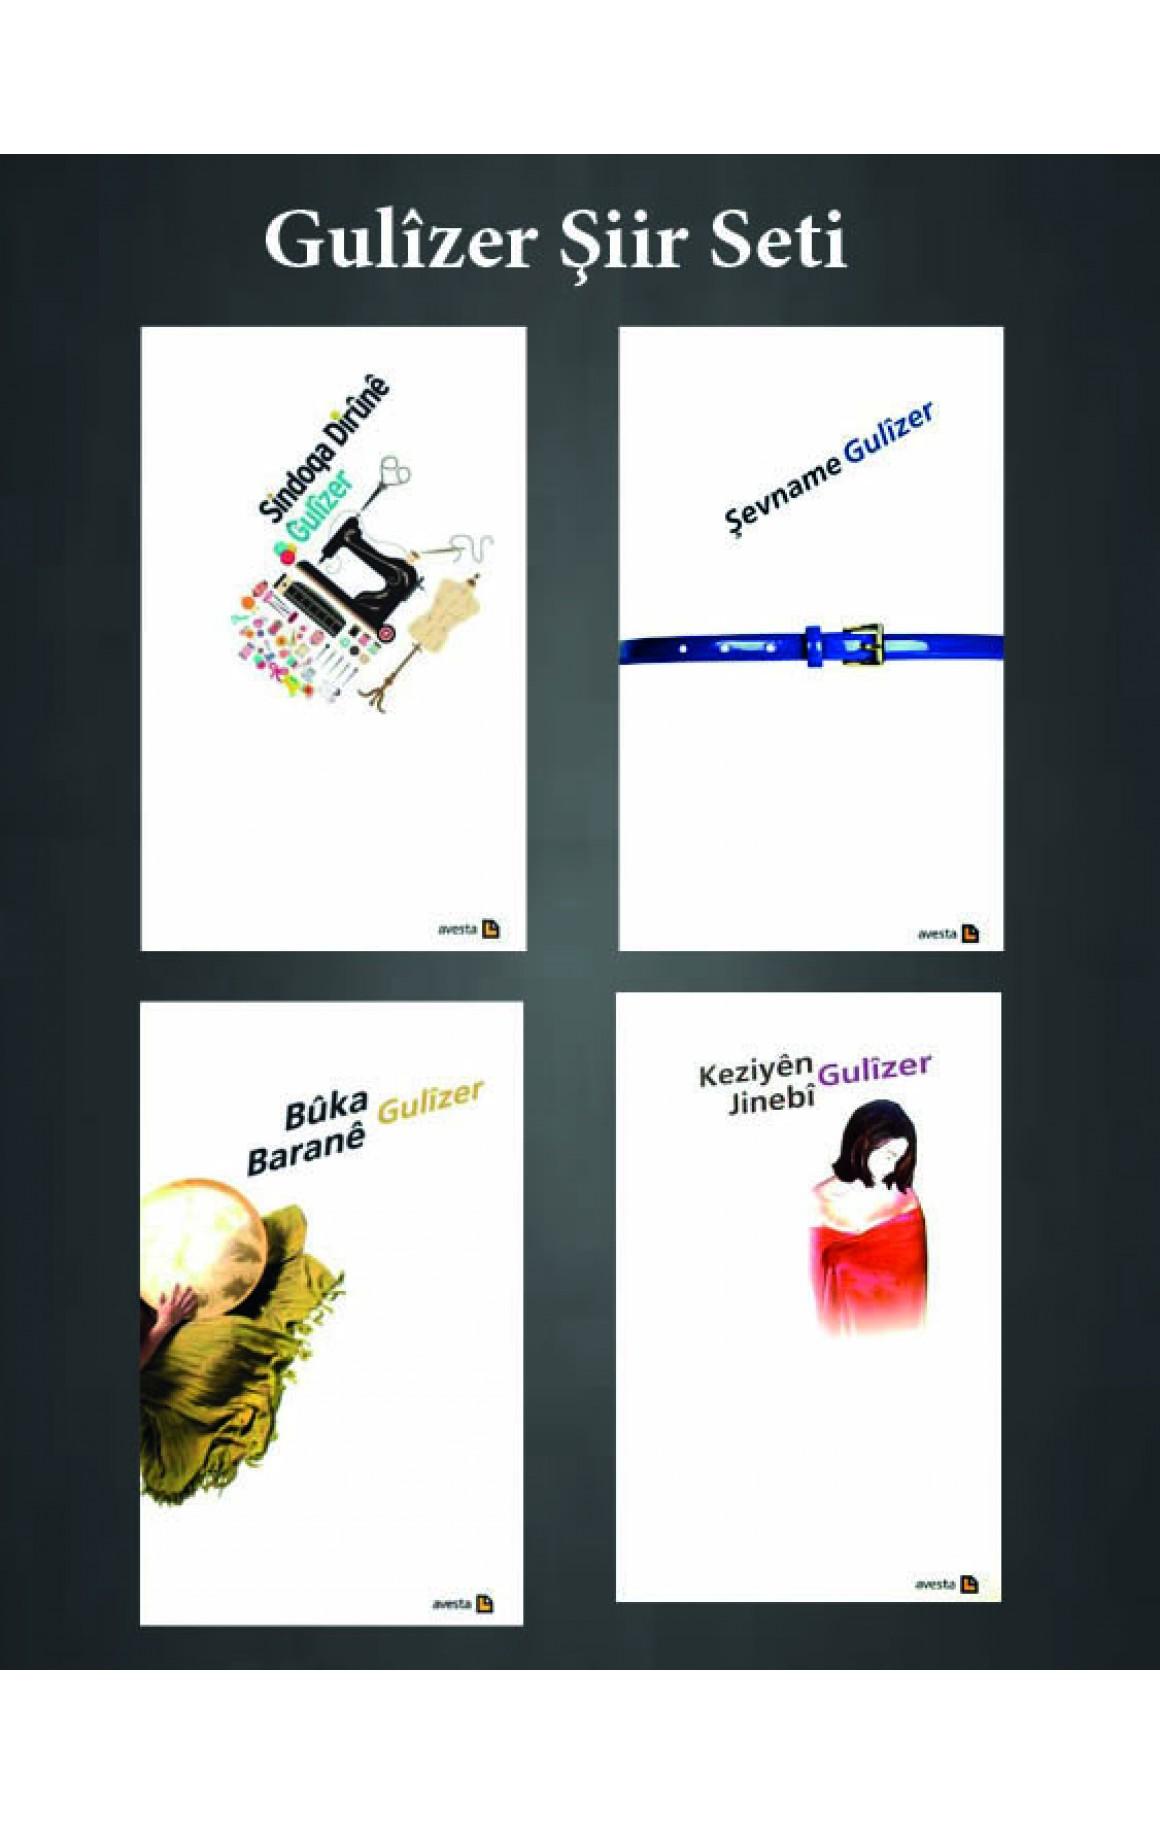 Gulizer Şiir Seti (3 kitap)